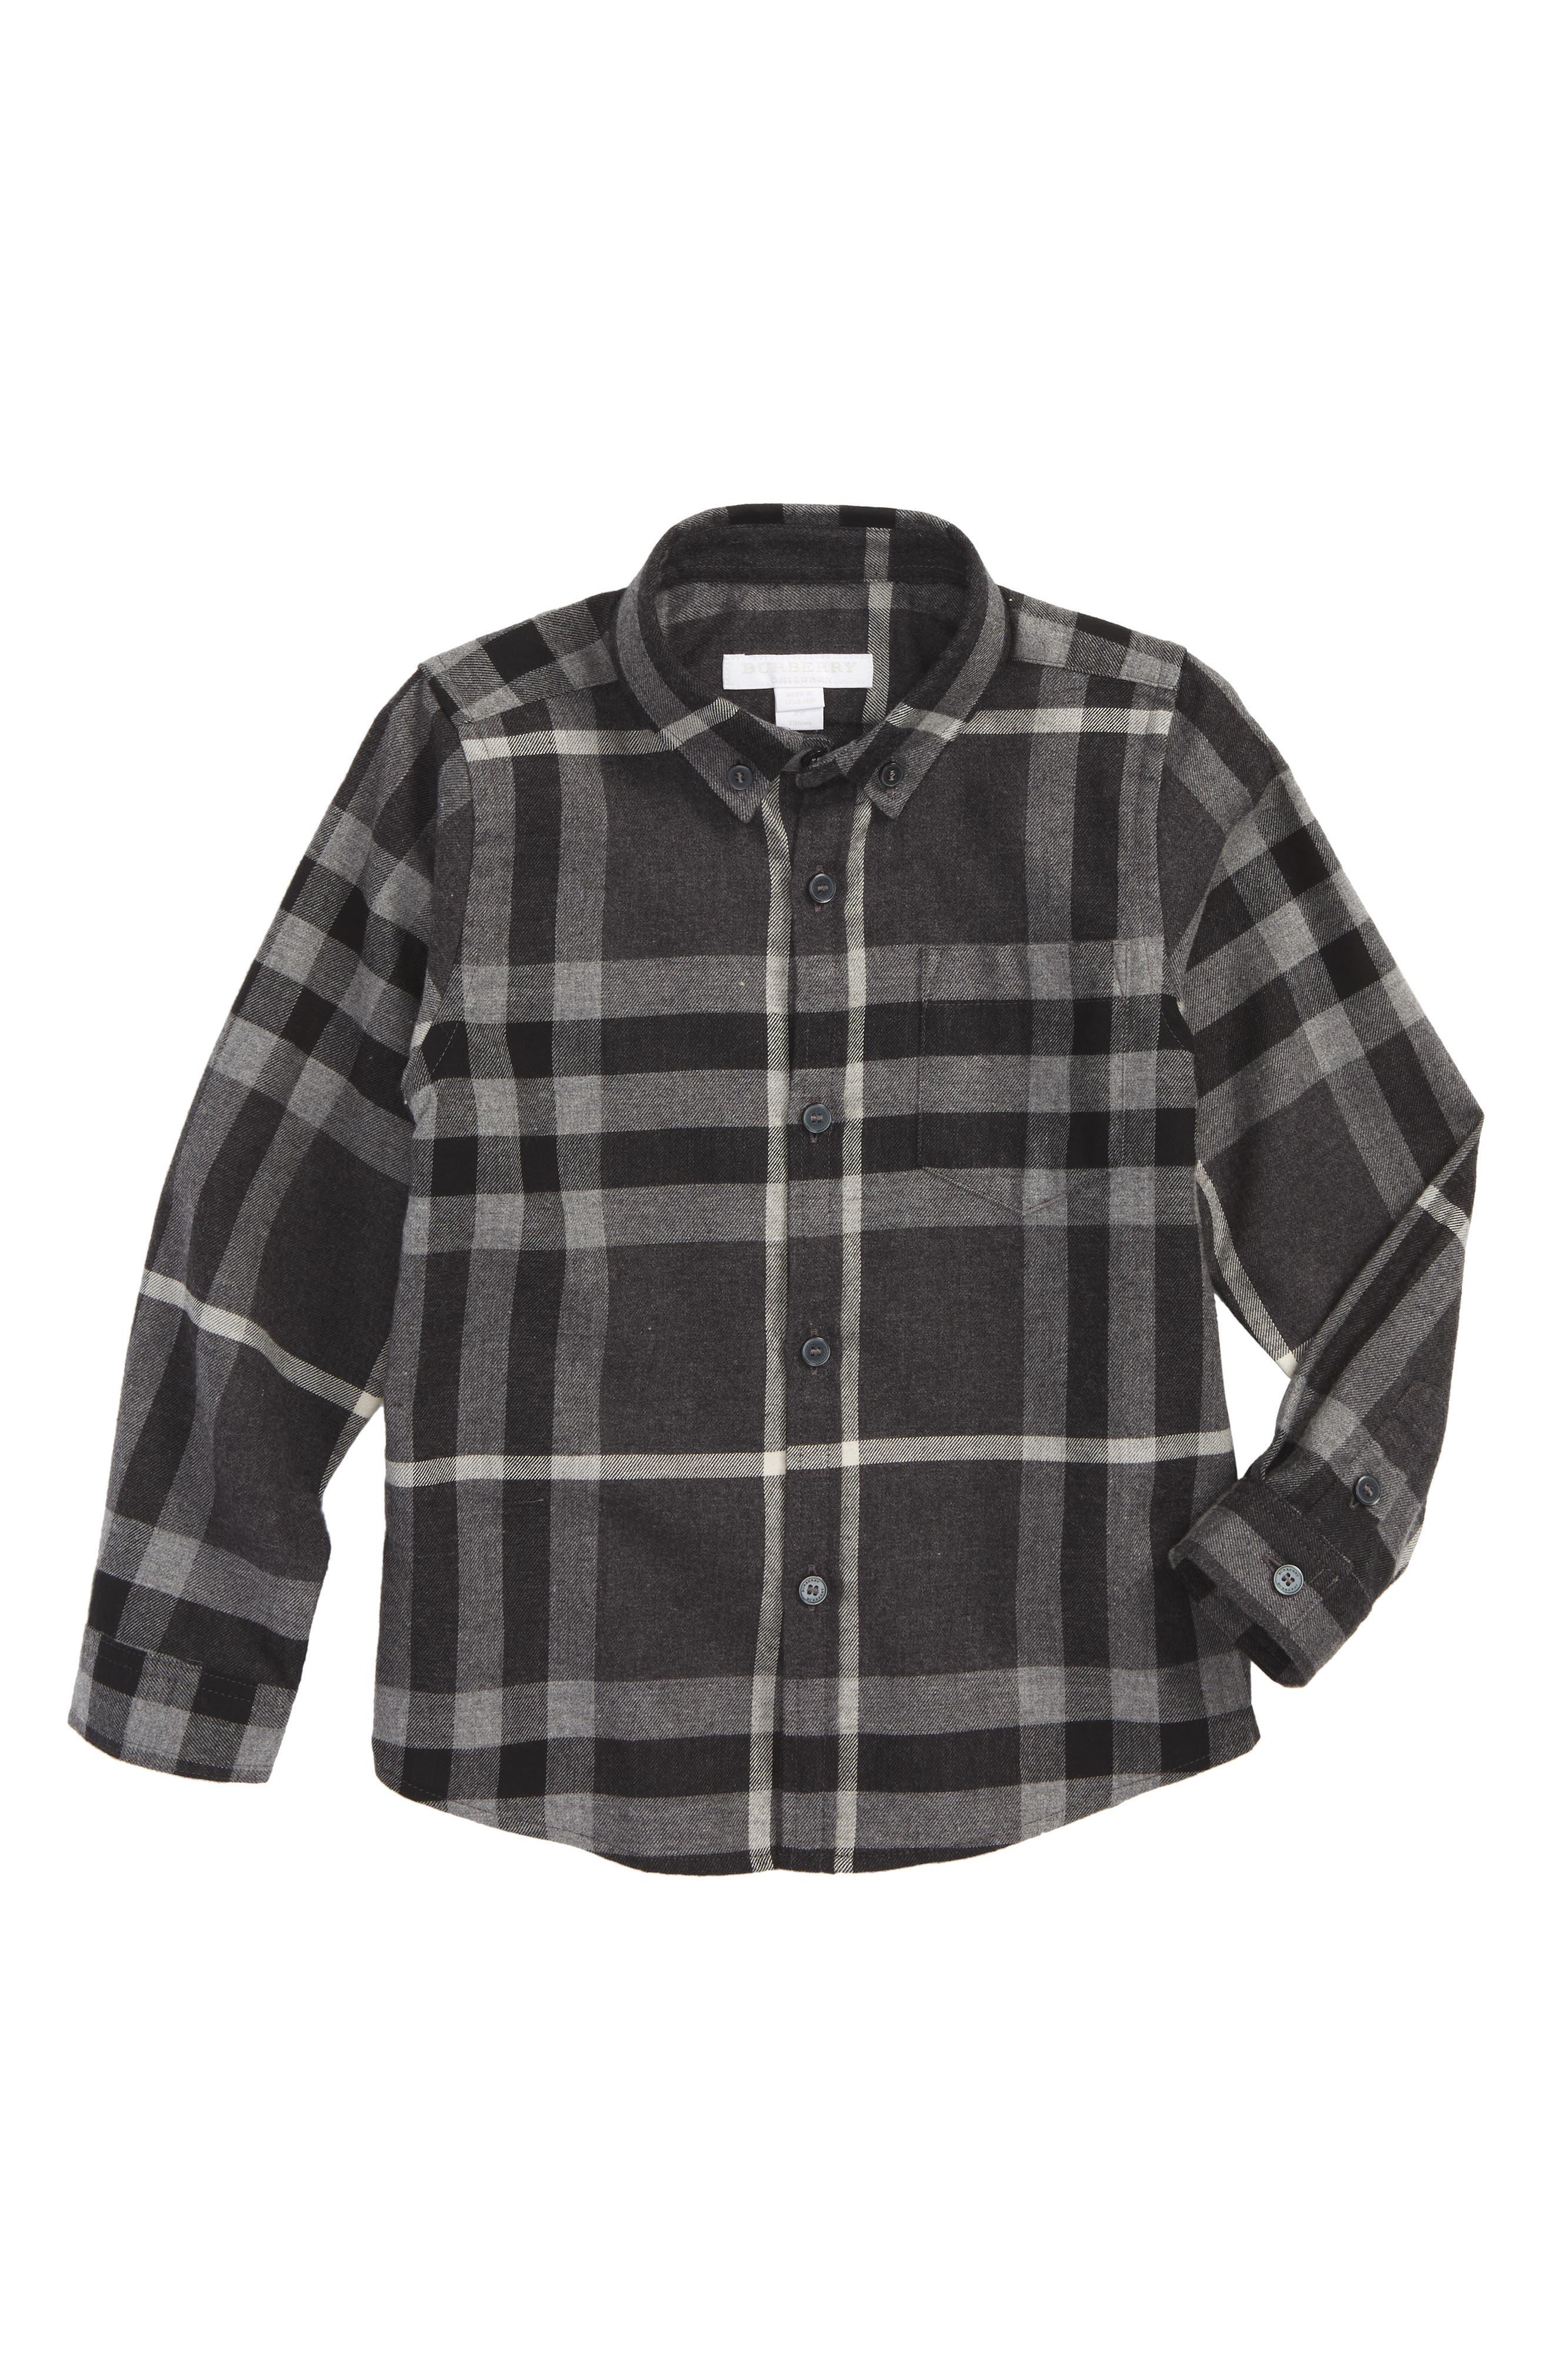 Alternate Image 1 Selected - Burberry Mini Fred Plaid Shirt (Little Boys & Big Boys)